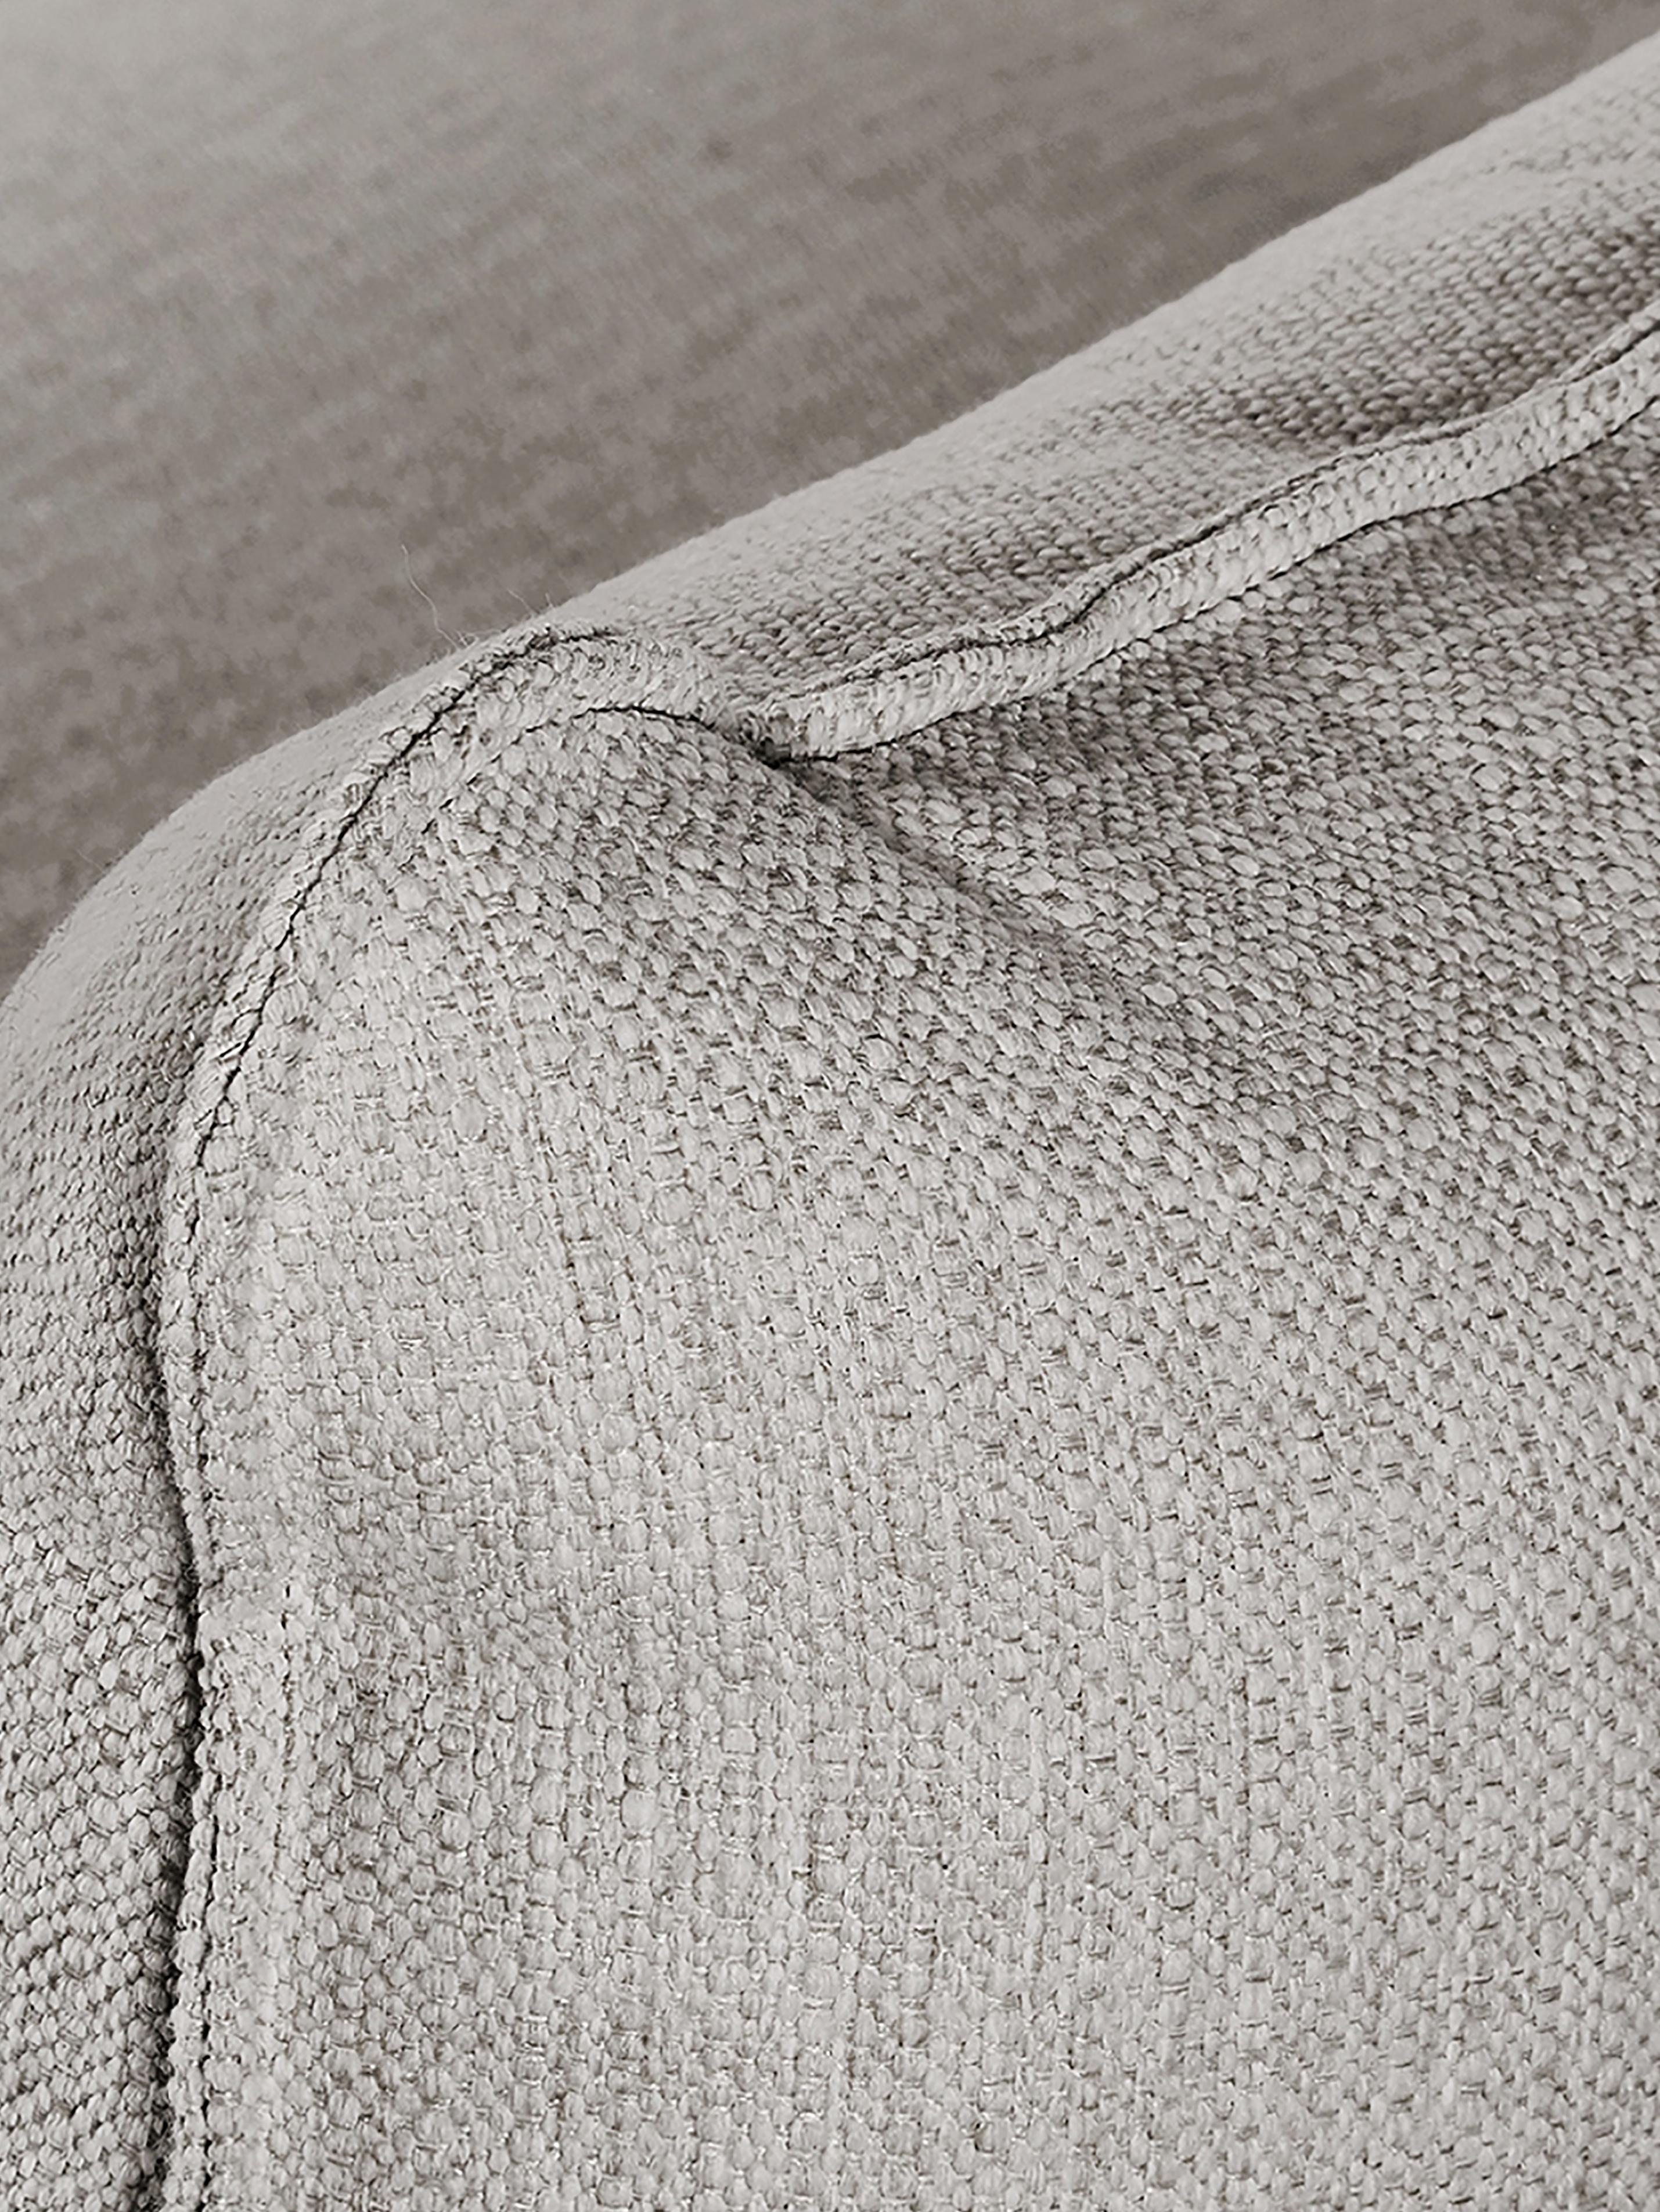 Duża sofa narożna Tribeca, Tapicerka: poliester Tkanina o odpor, Stelaż: lite drewno sosnowe, Nogi: lite drewno sosnowe, laki, Beżowoszary, S 315 x G 228 cm